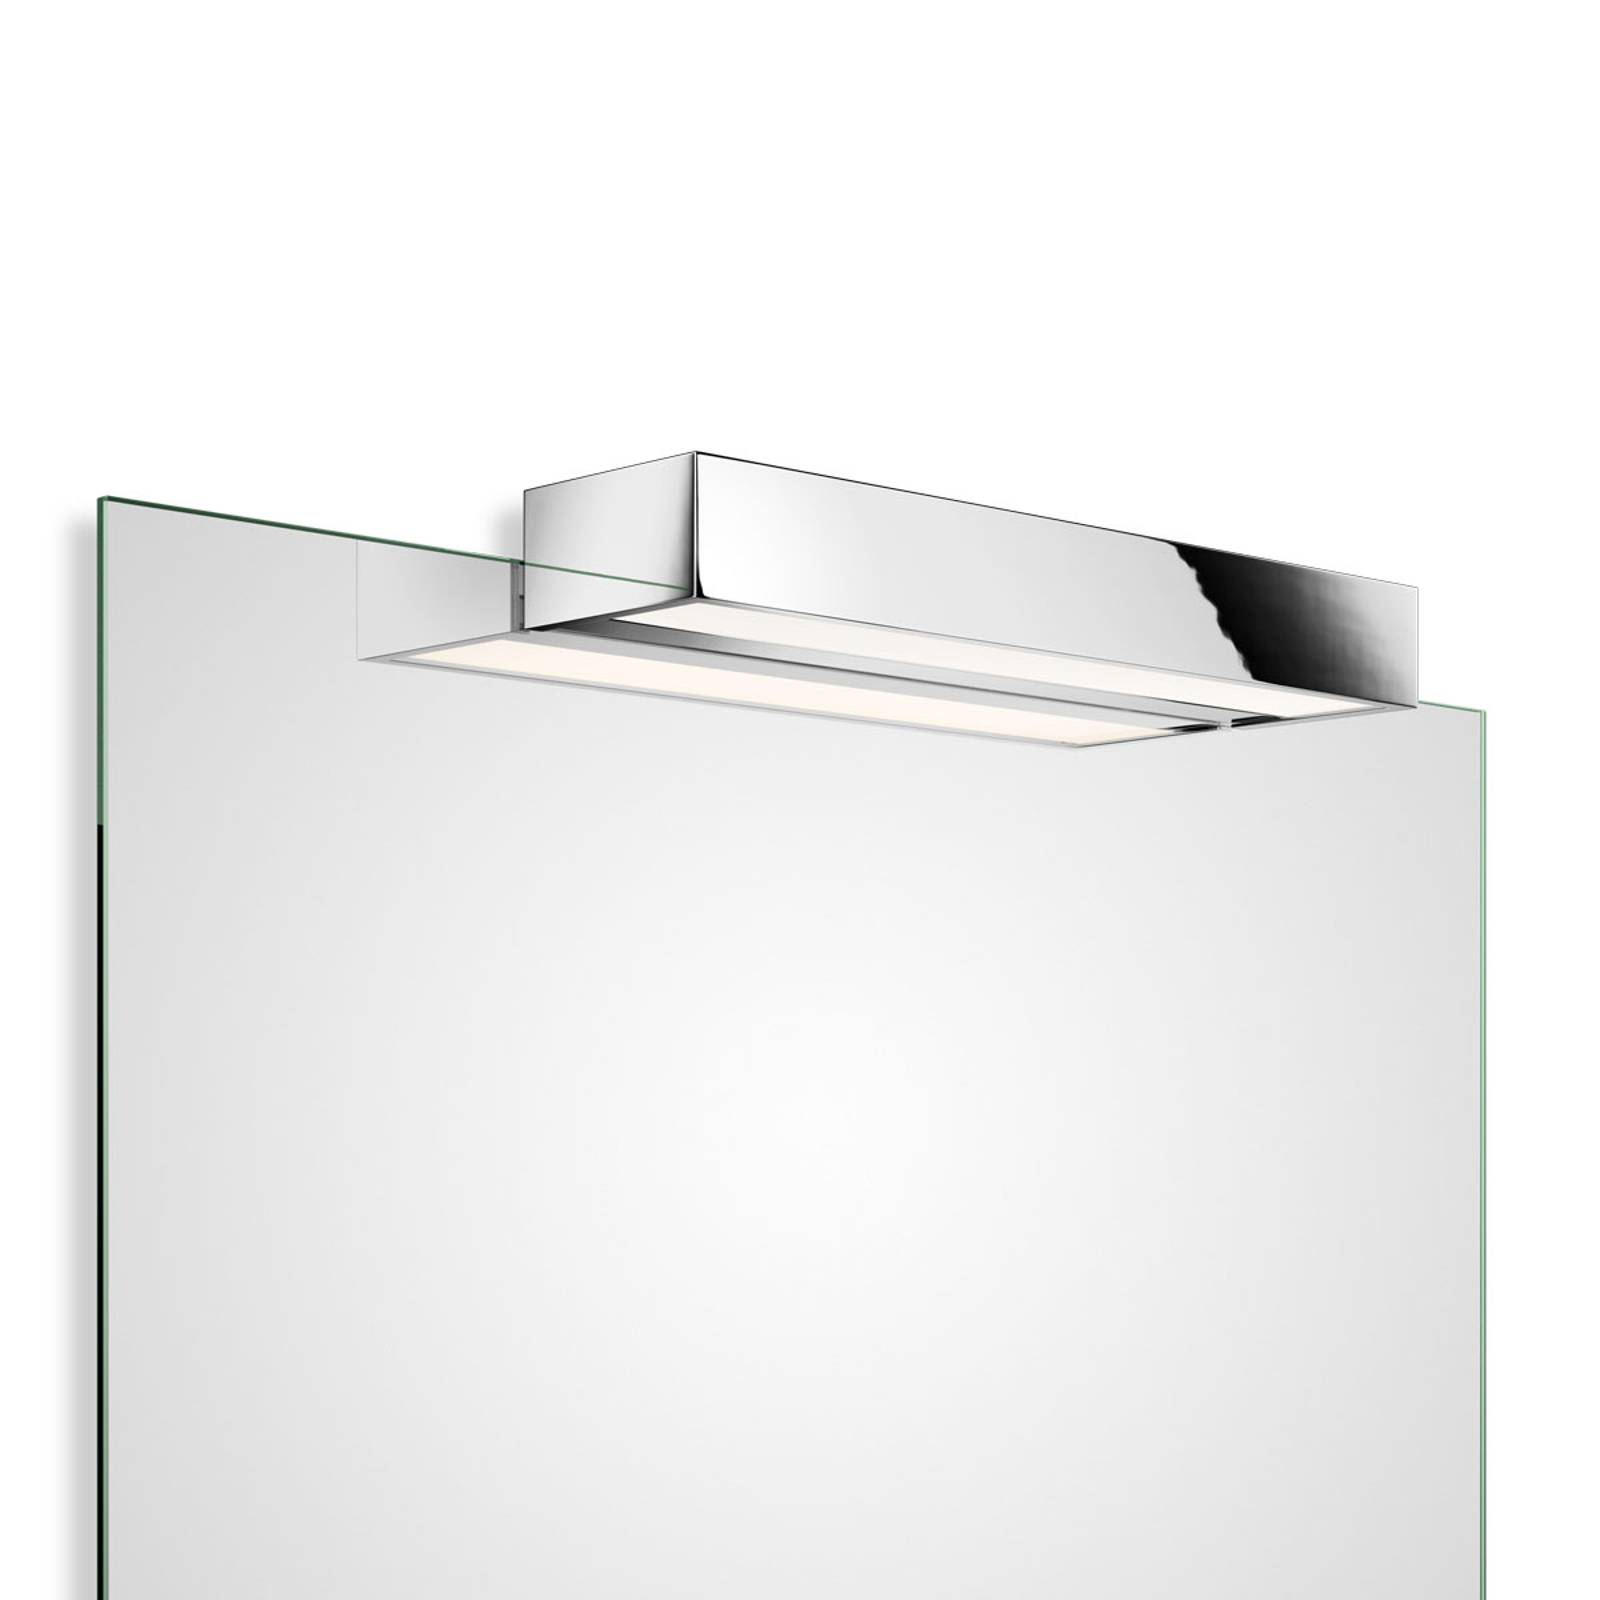 Decor Walther Box 1-40 N -LED-peililamppu 2 700 K